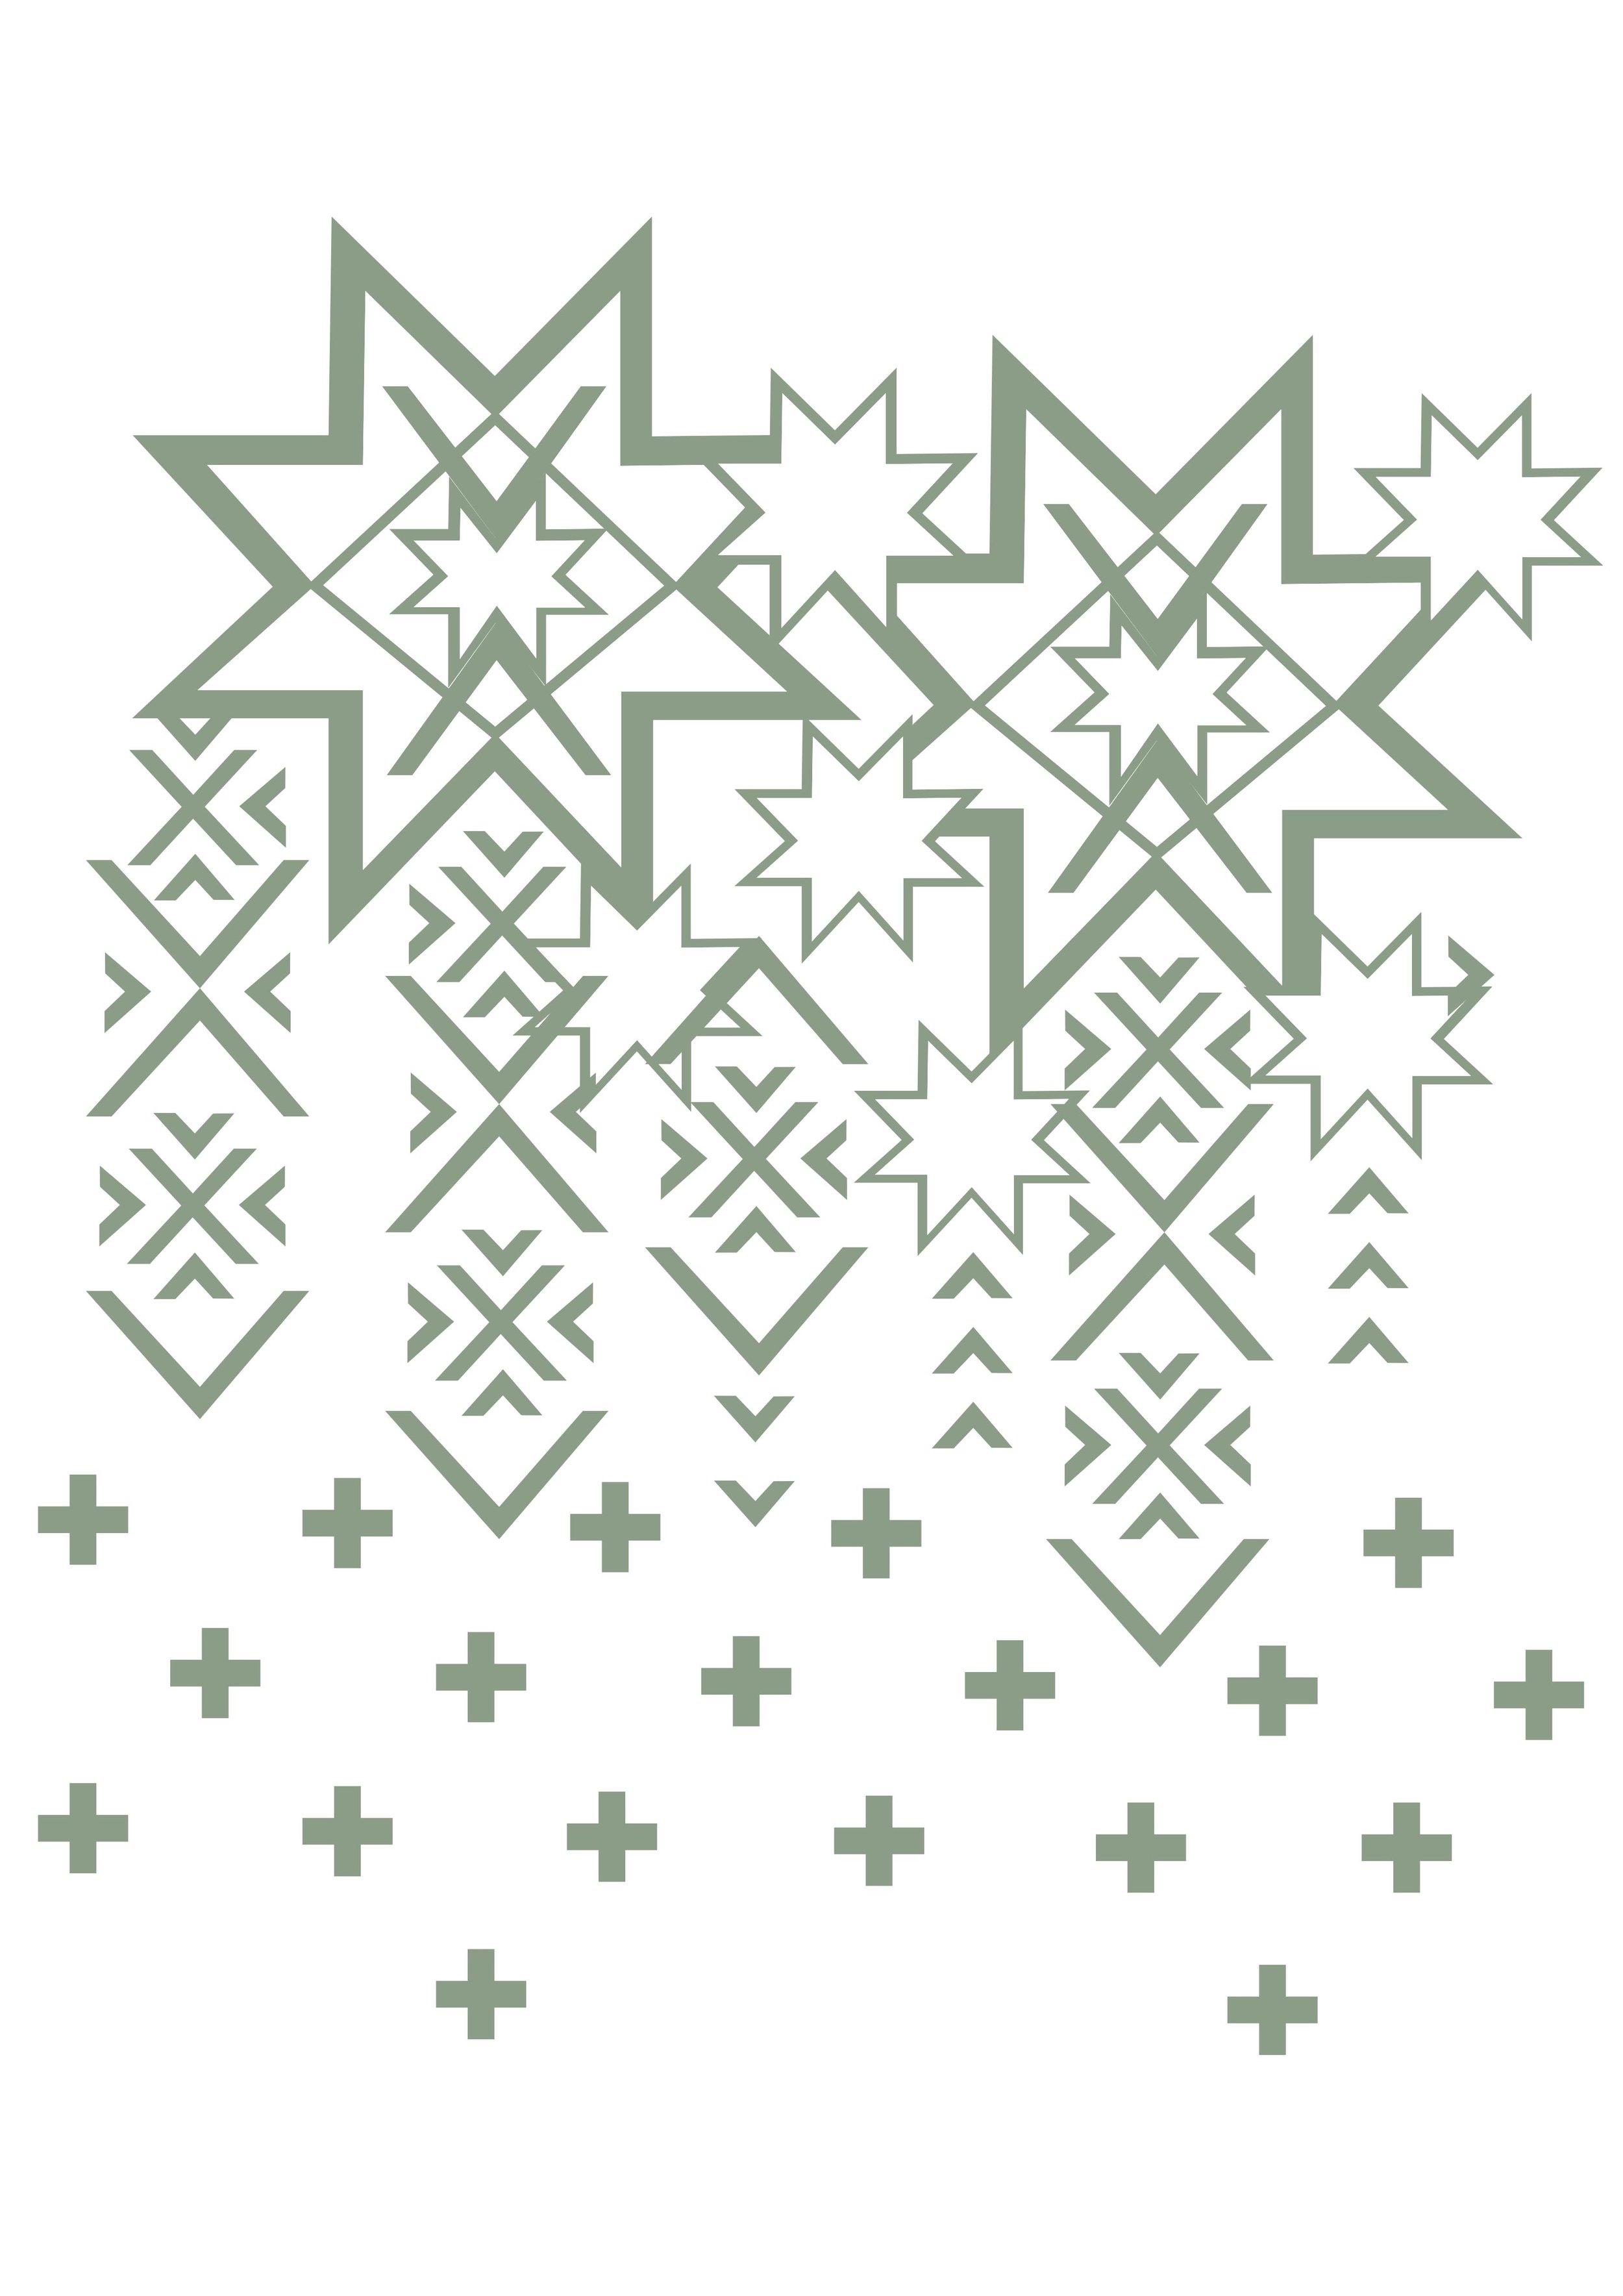 Illustrator file of more finalized pattern